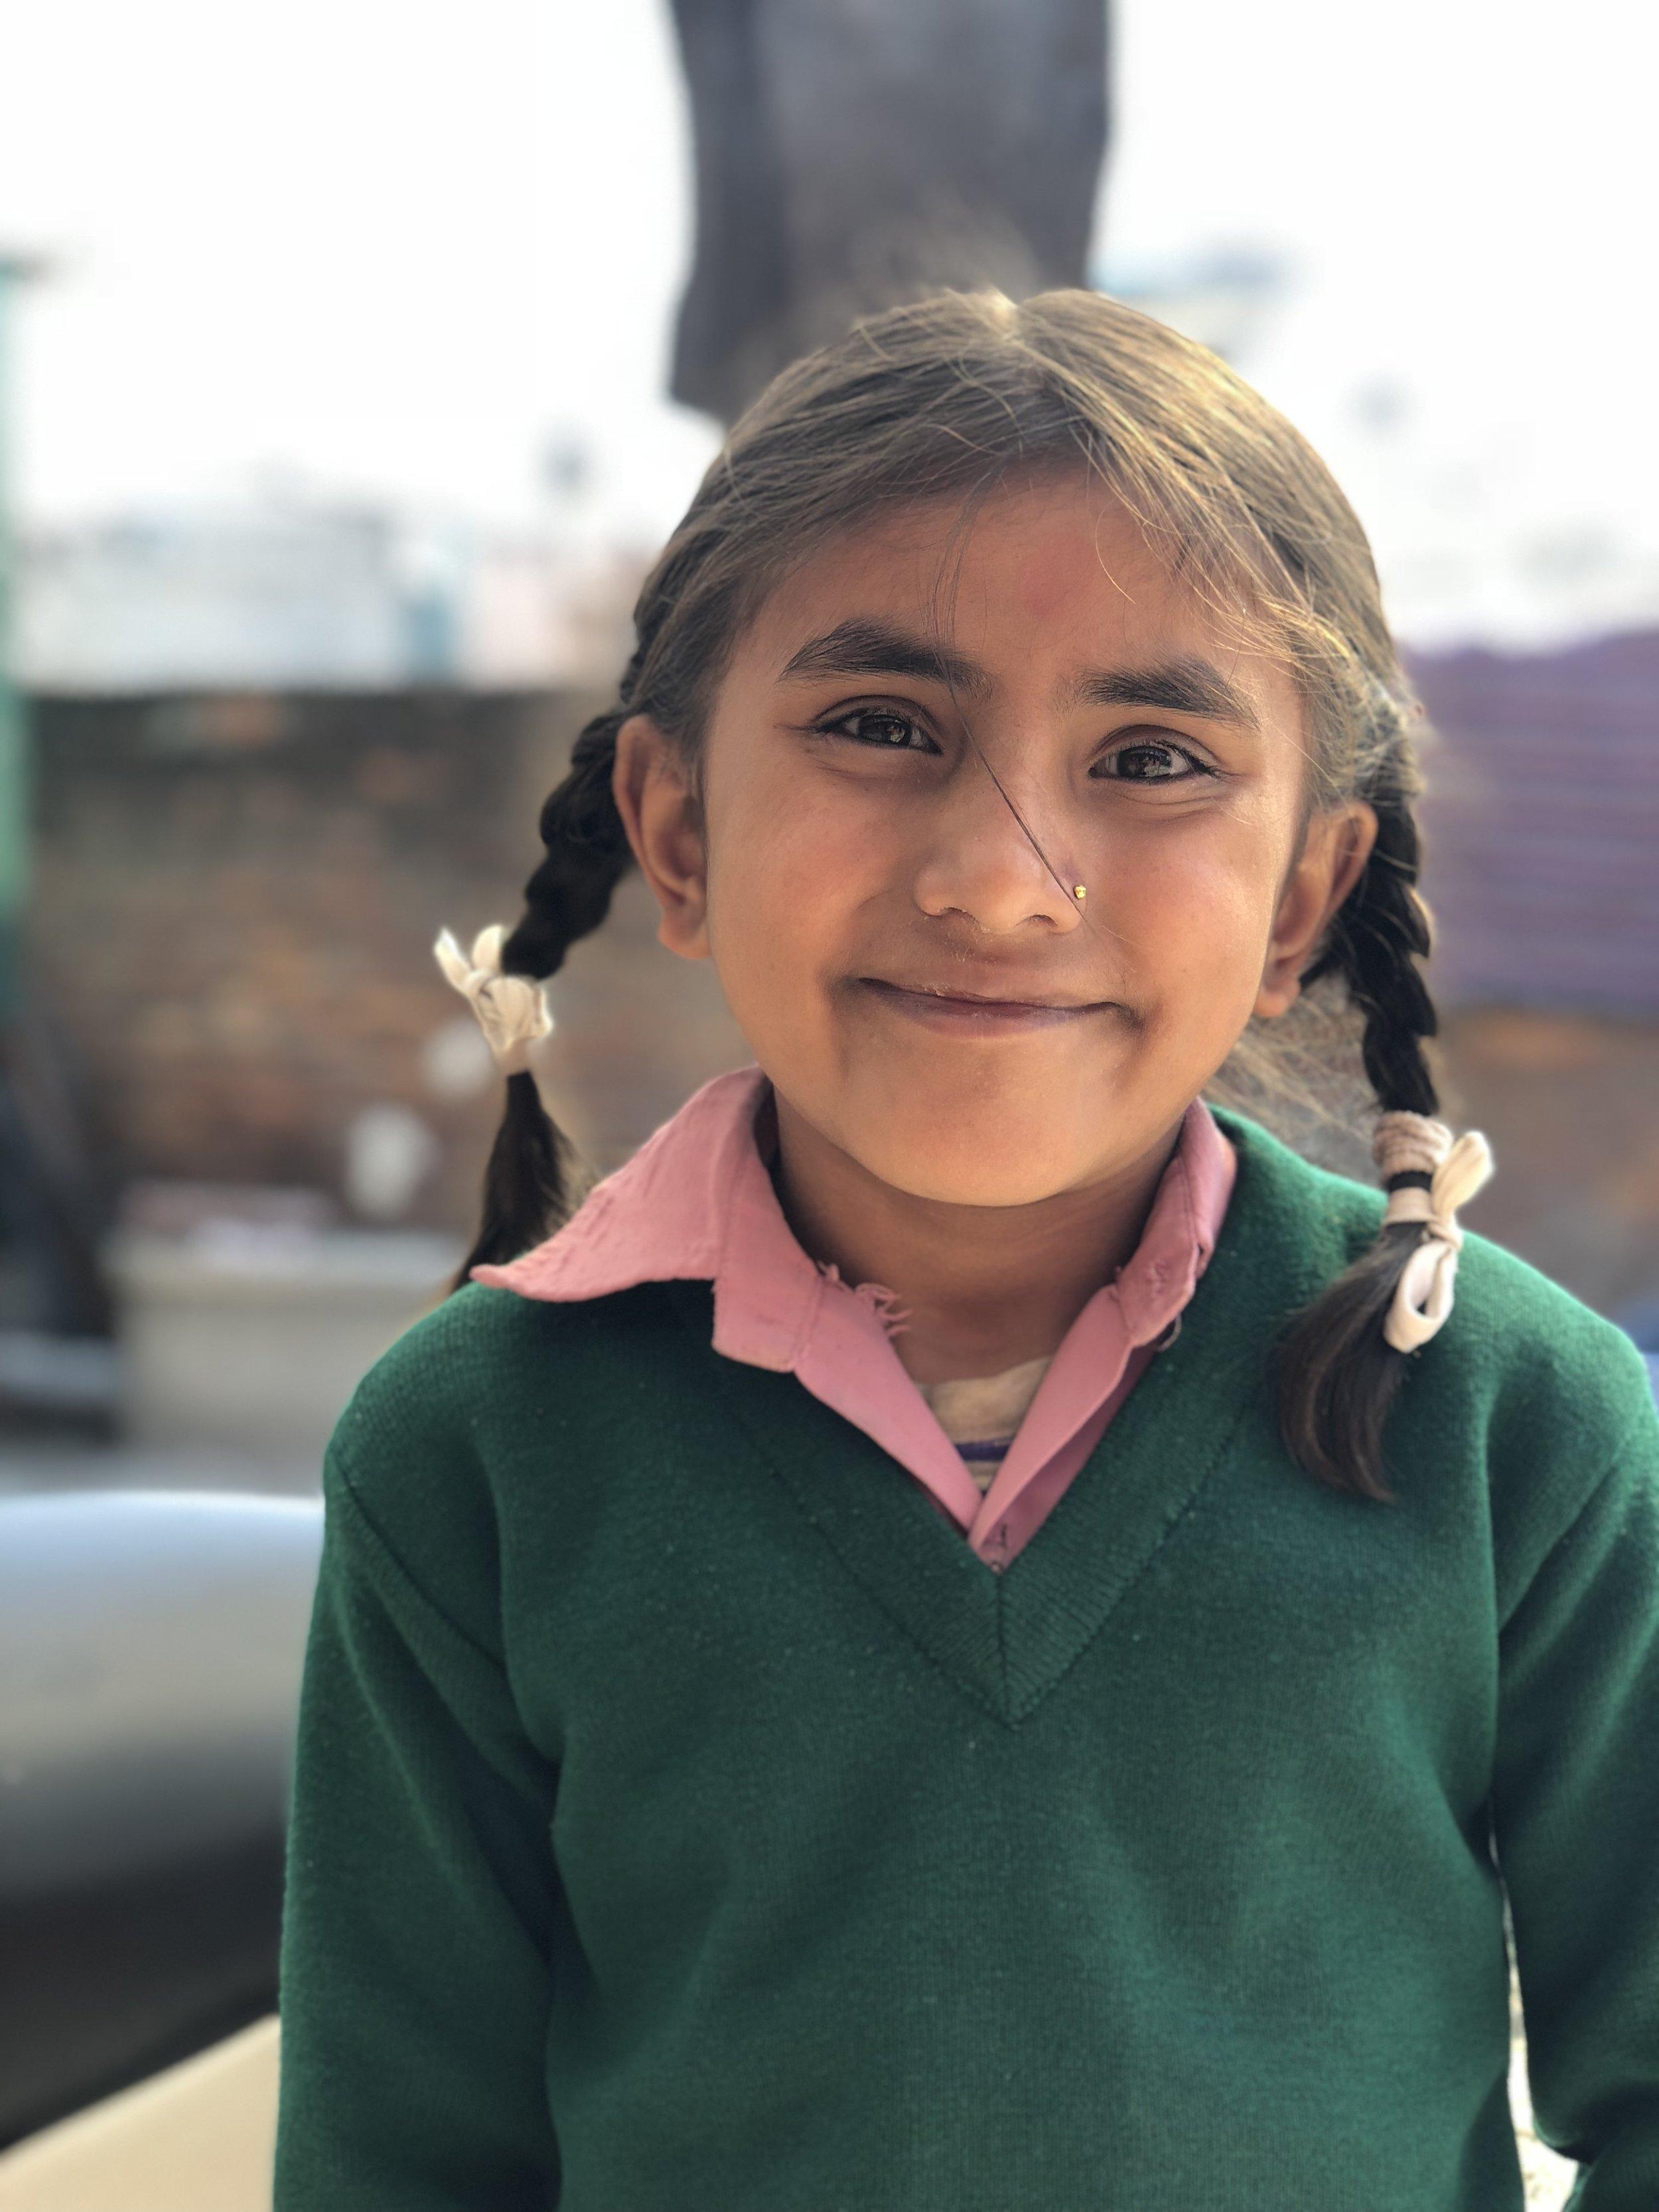 Anjita  Age 8  She wants to become an engineer